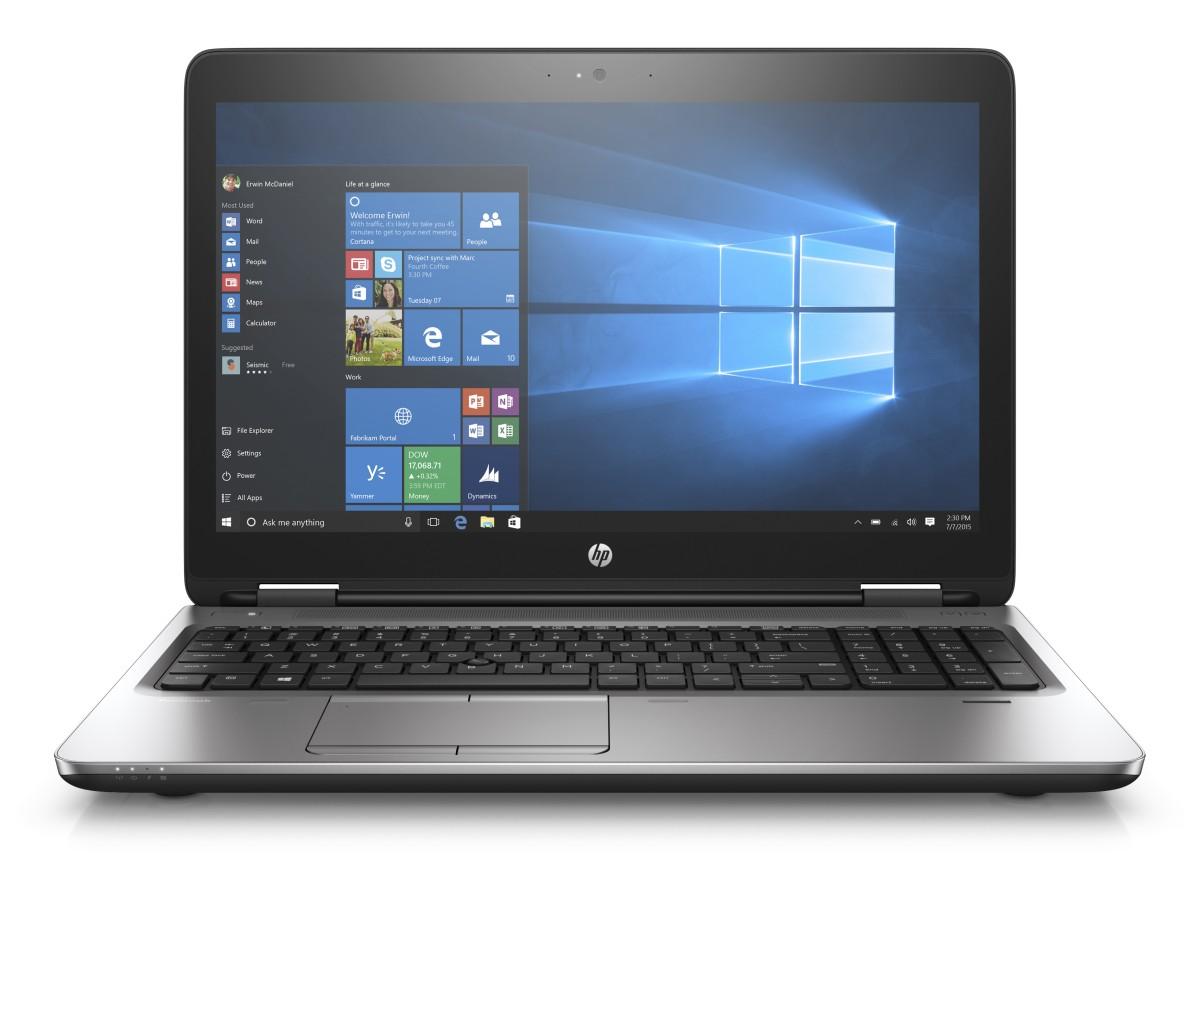 "HP ProBook 655 G3 A10-8730B 15.6"" FHD CAM, 4GB, 500GB, DVDRW, ac, BT, FpR, no backlit, serial, Win 10 Pro"